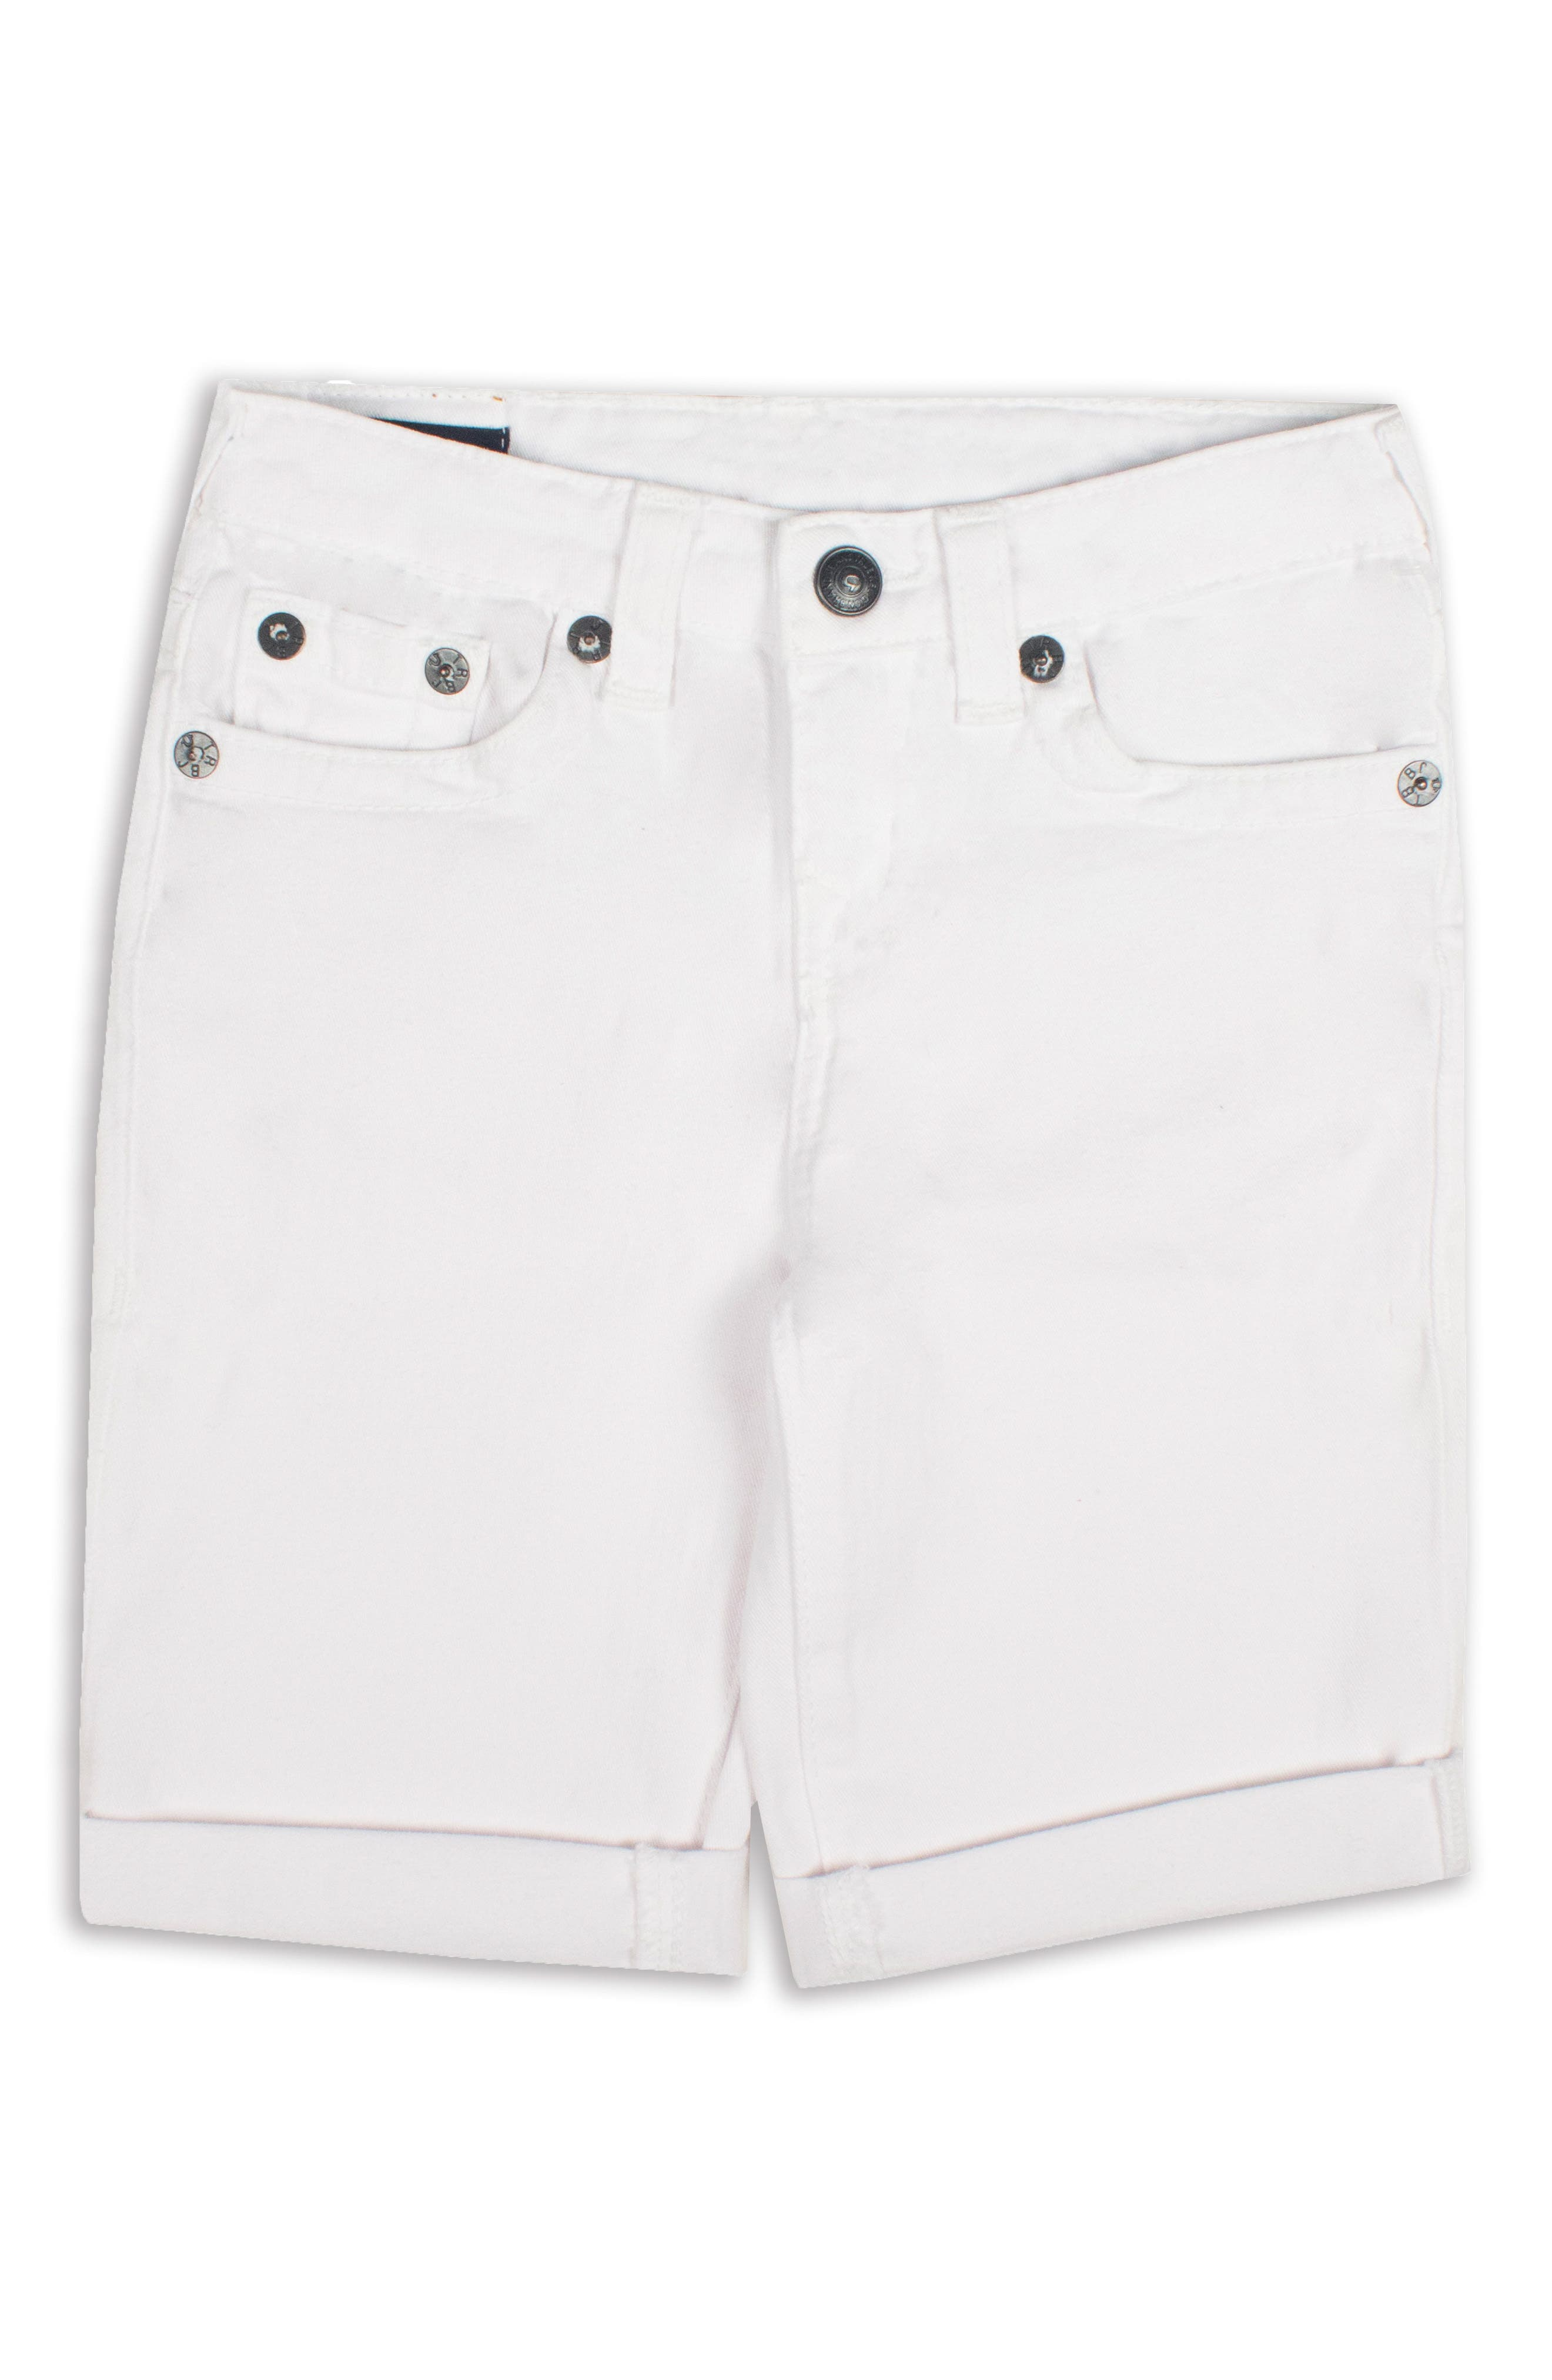 Geno Denim Shorts,                         Main,                         color, White